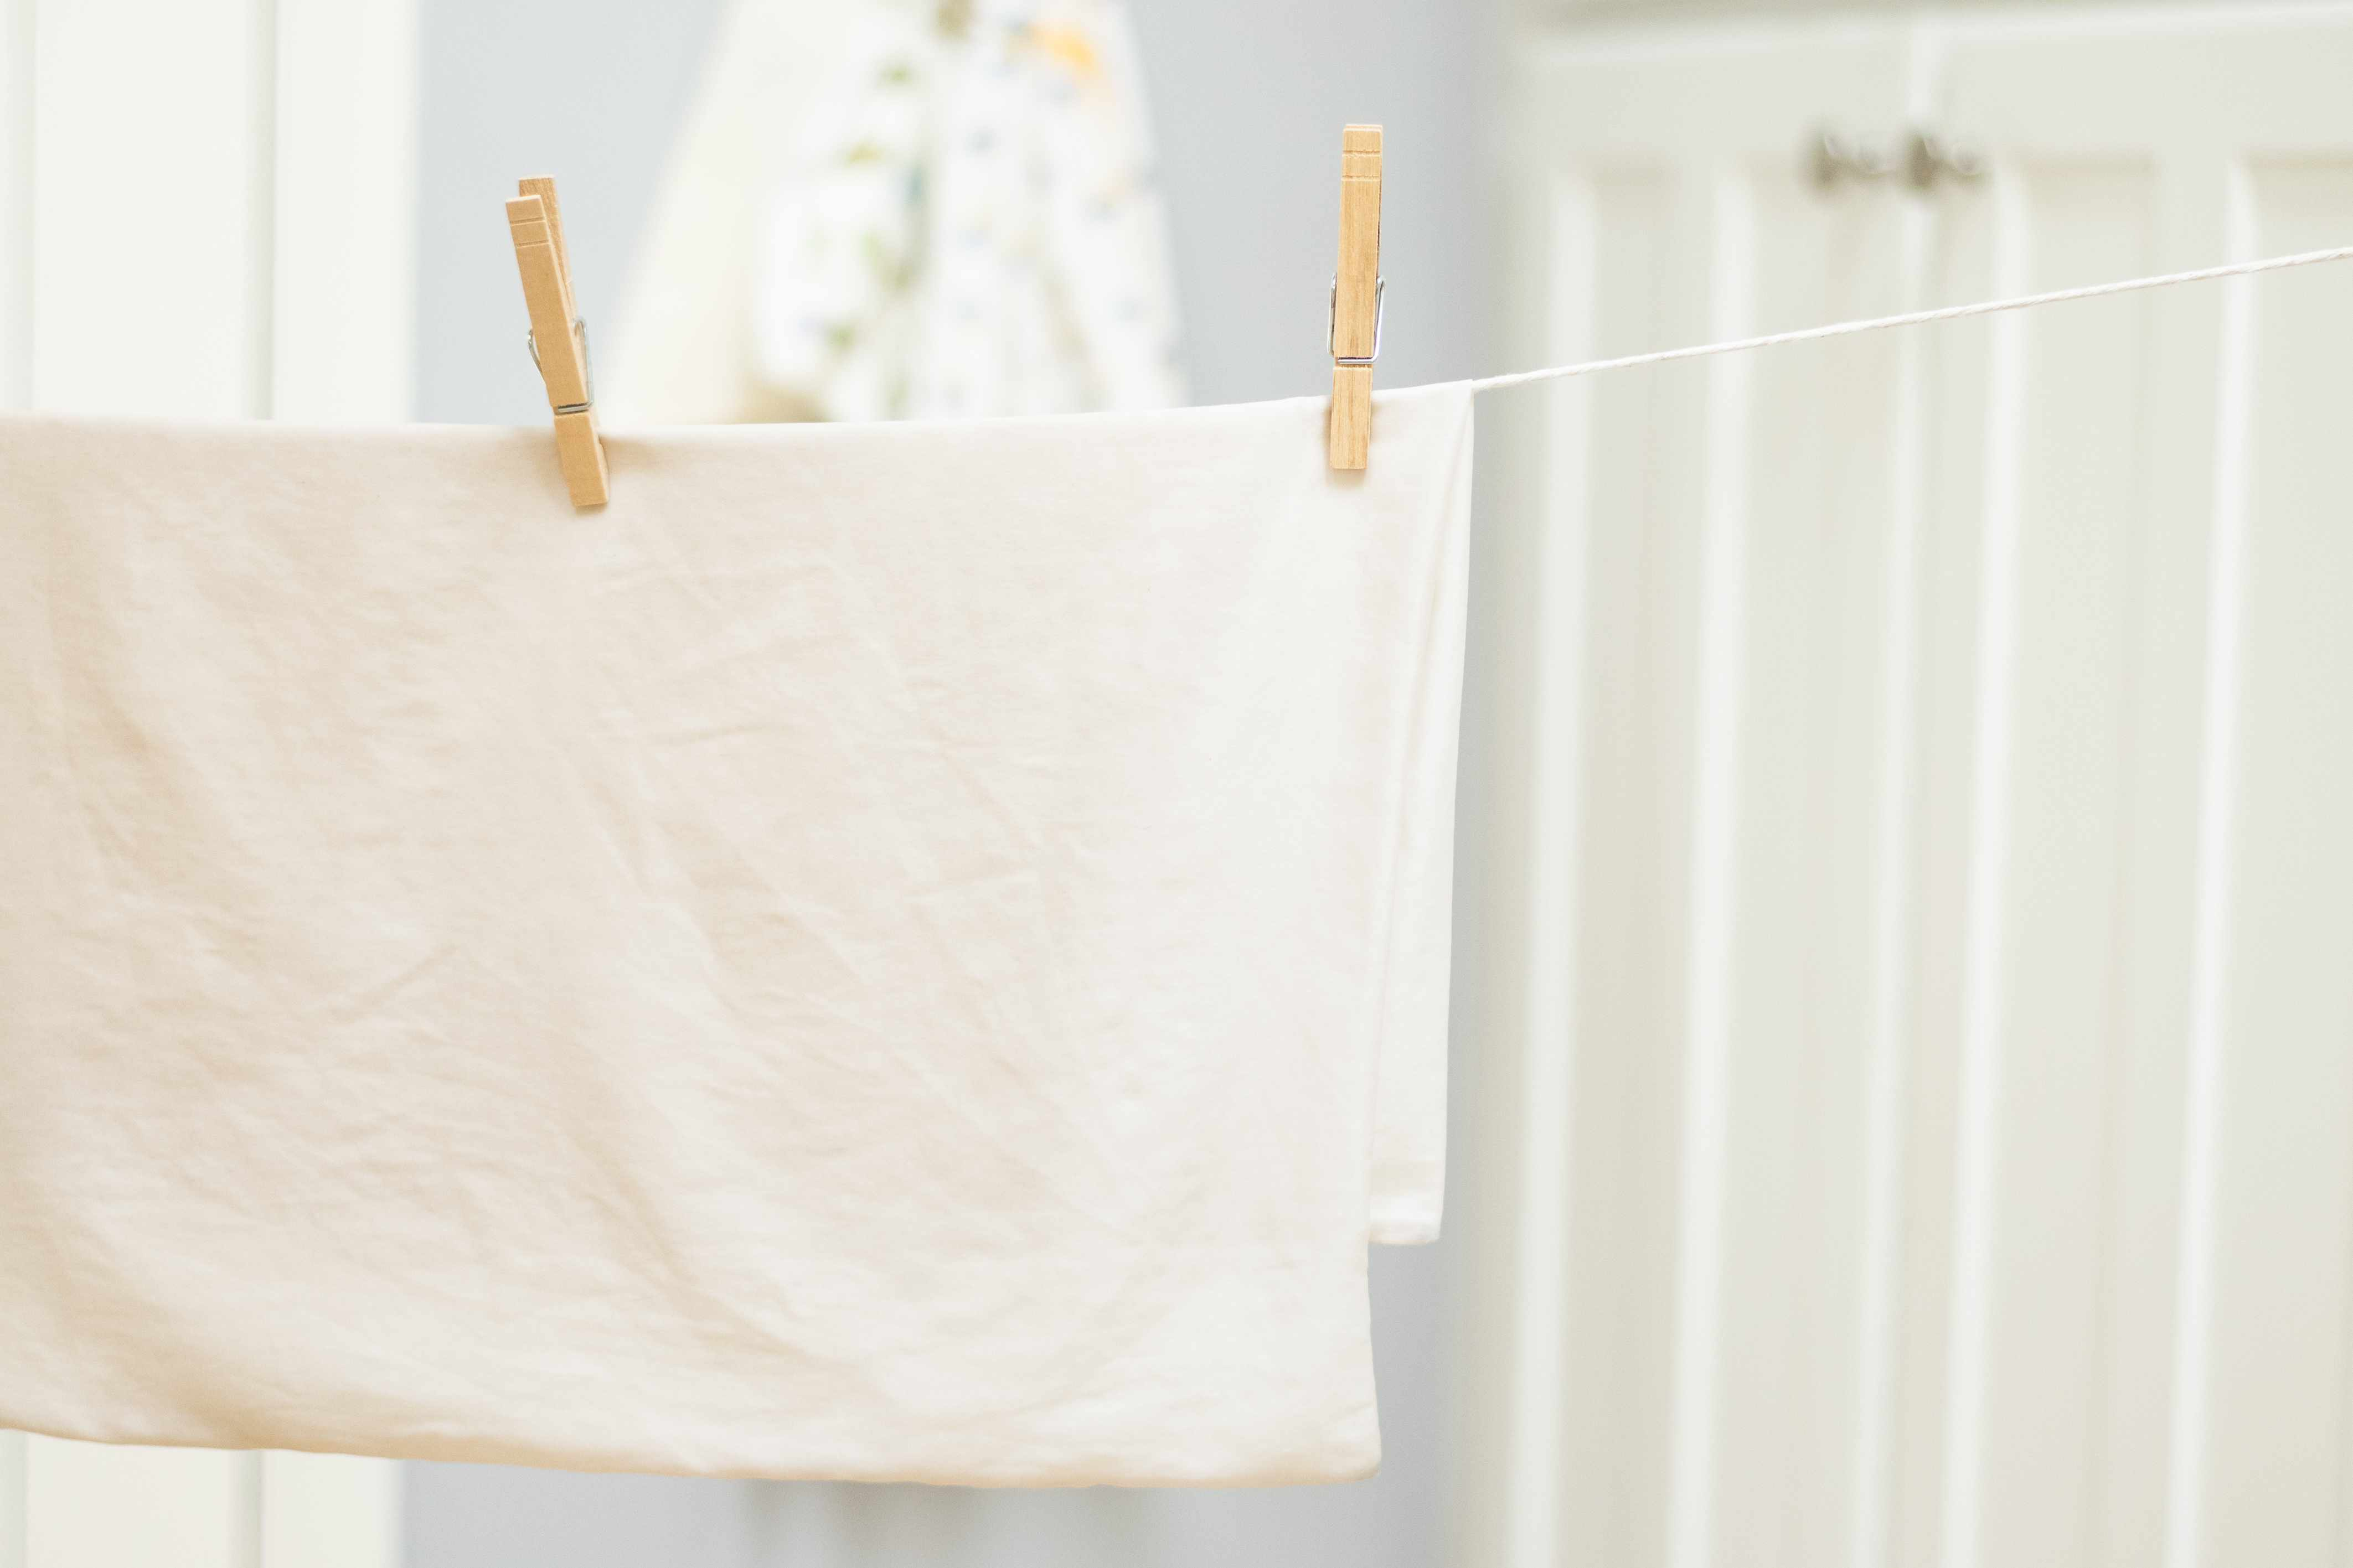 line-drying a silk pillowcase